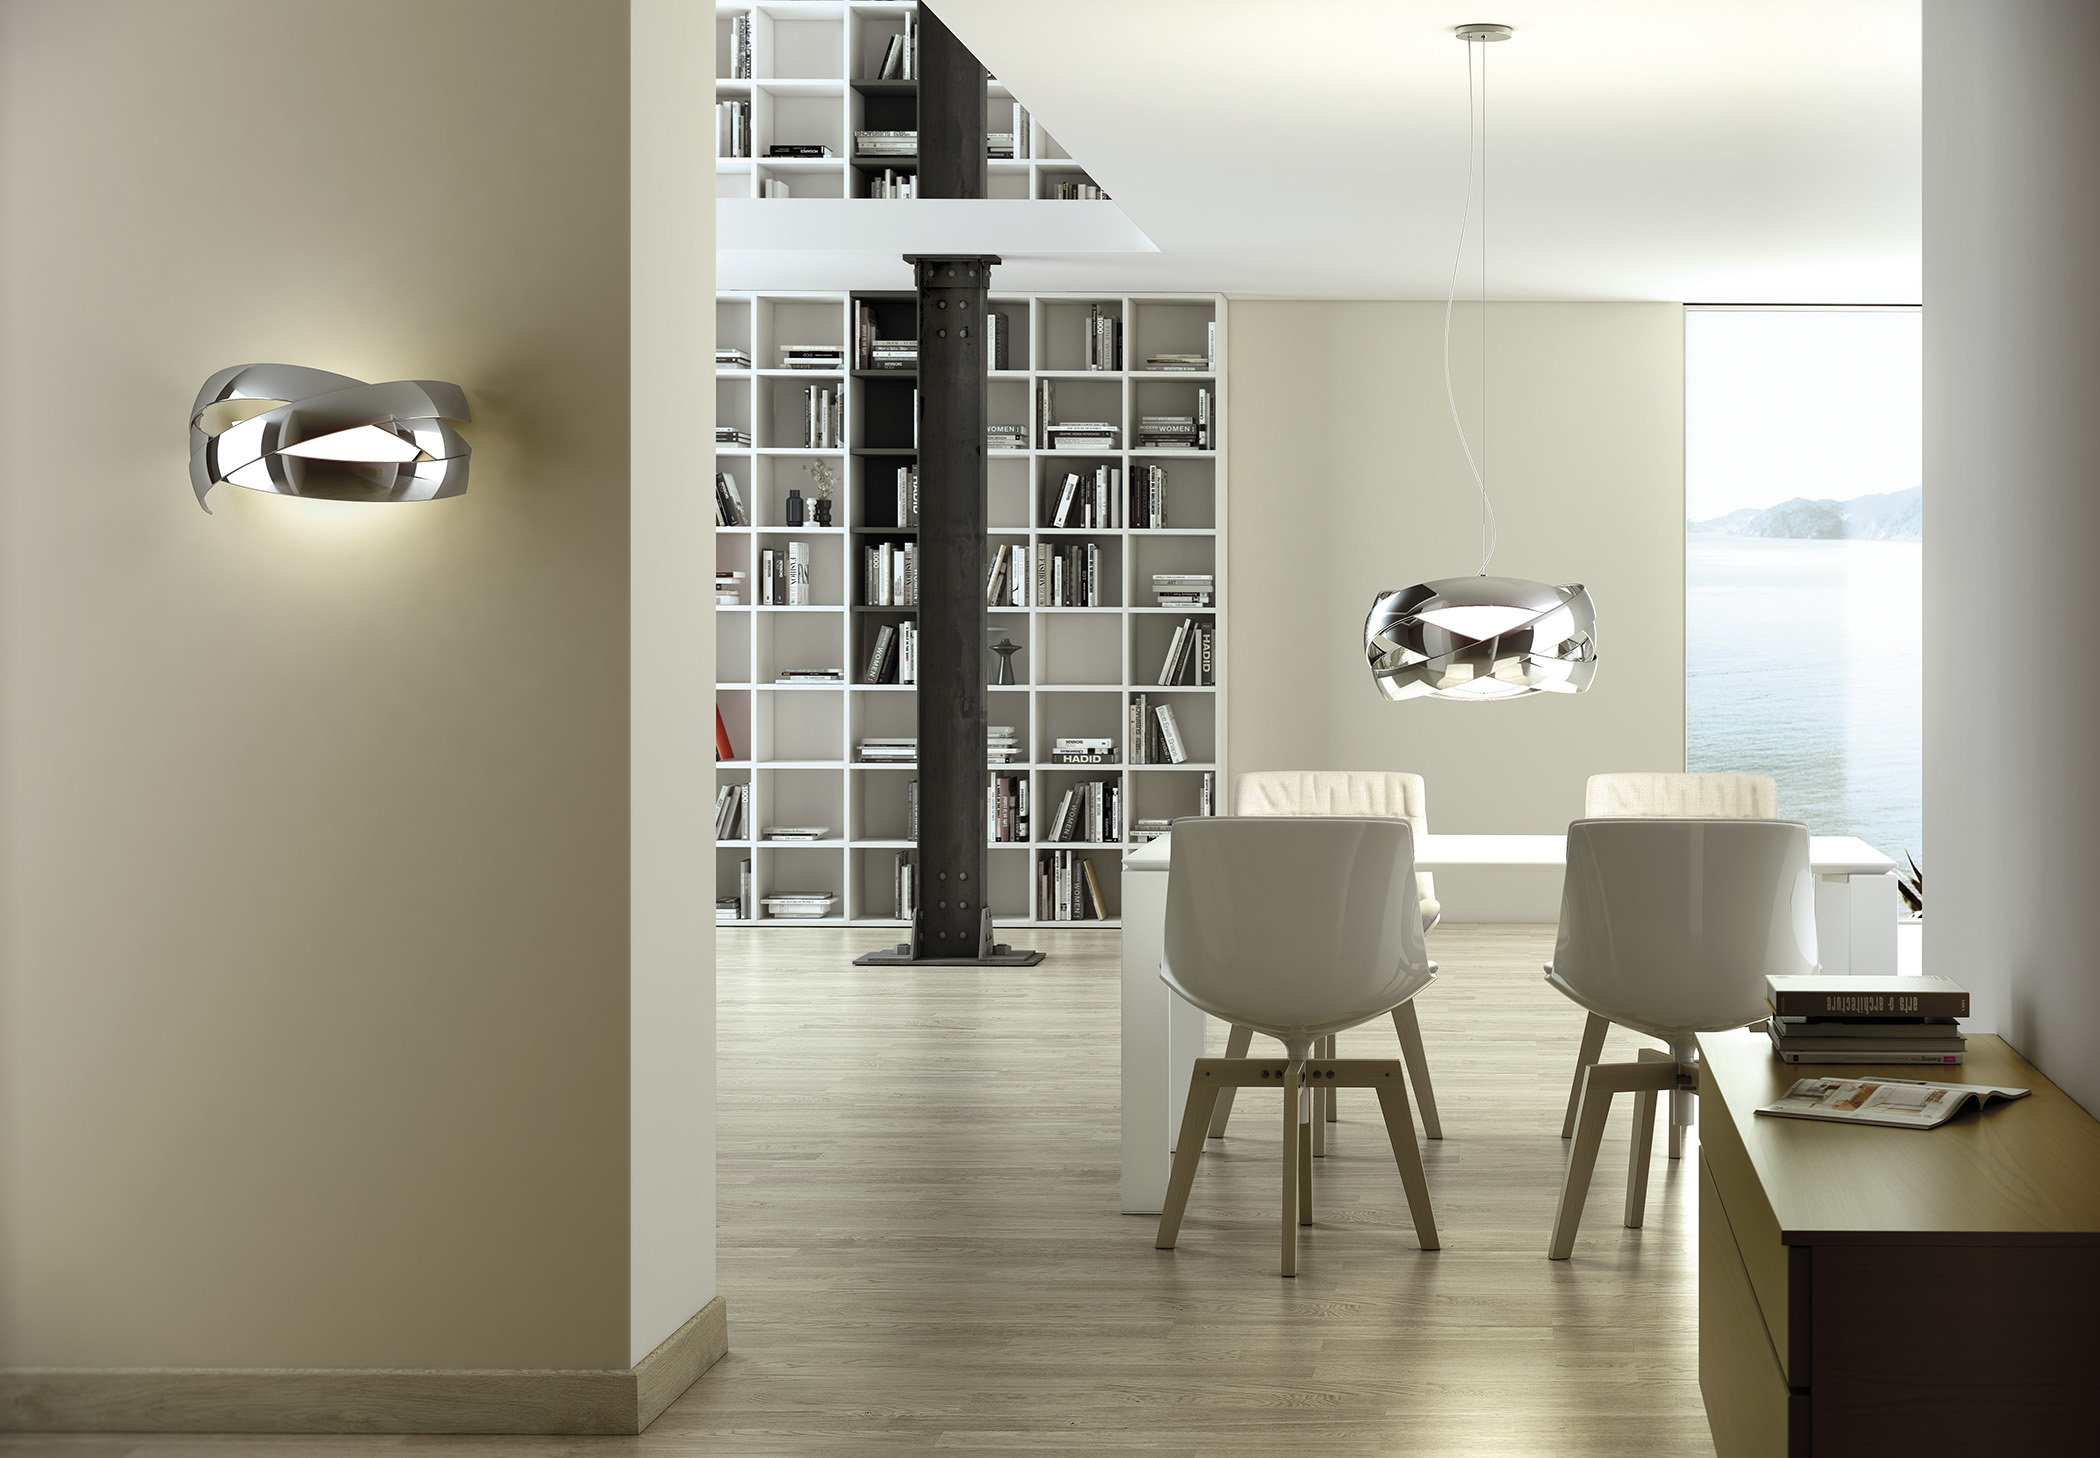 Siso A 2990 Wall Lamp Estiluz Image Ambient 01 2